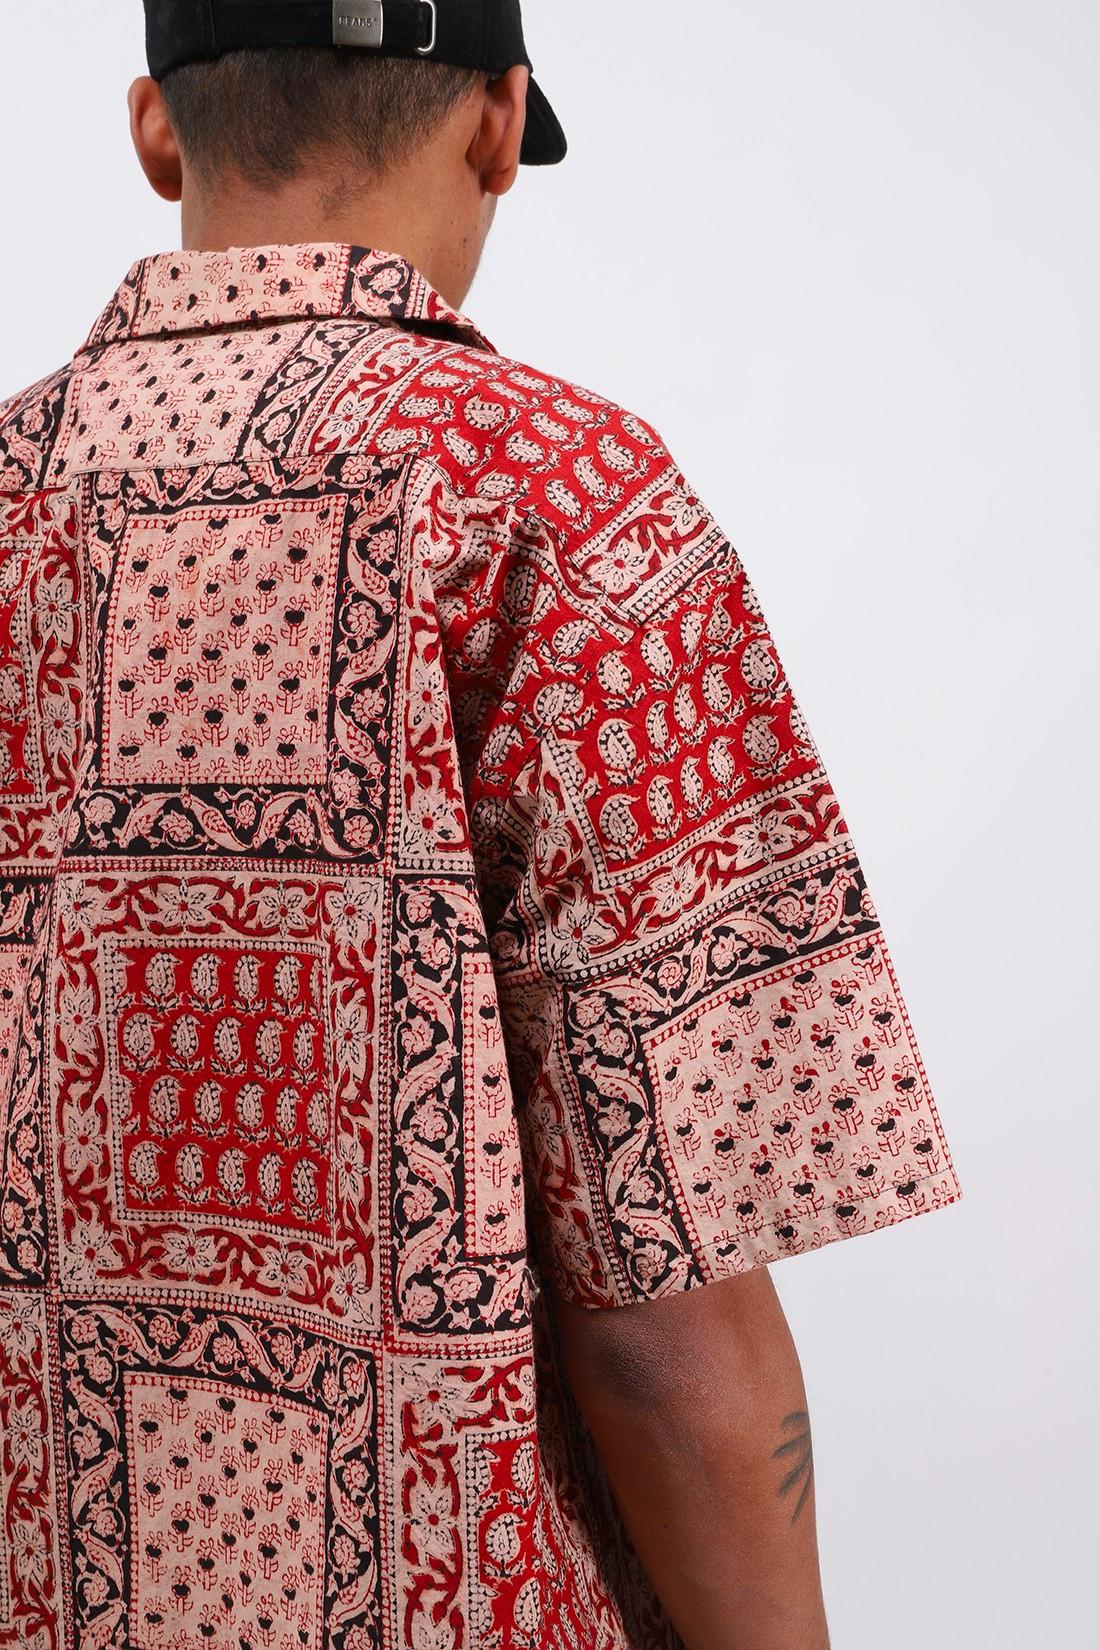 BEAMS PLUS / Ss open collar block print Red